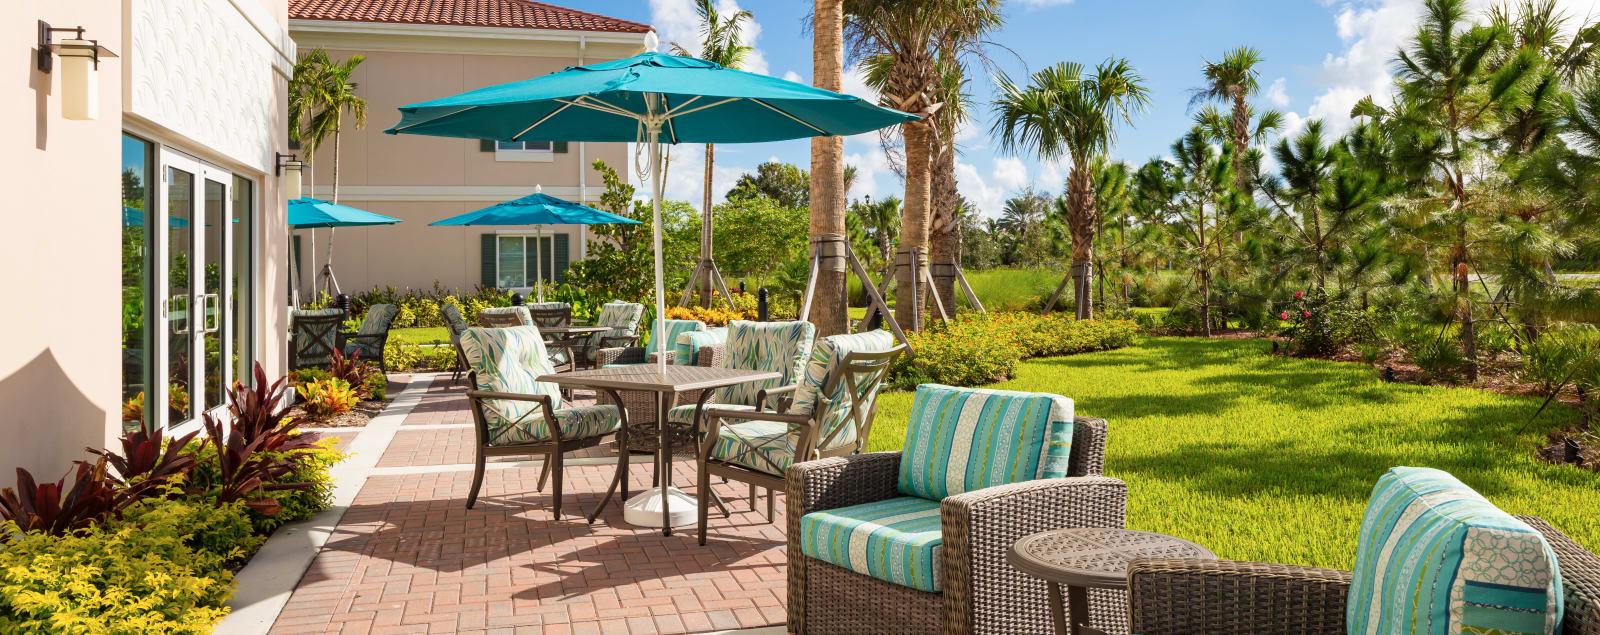 Schedule a senior living tour in Palm Beach Gardens